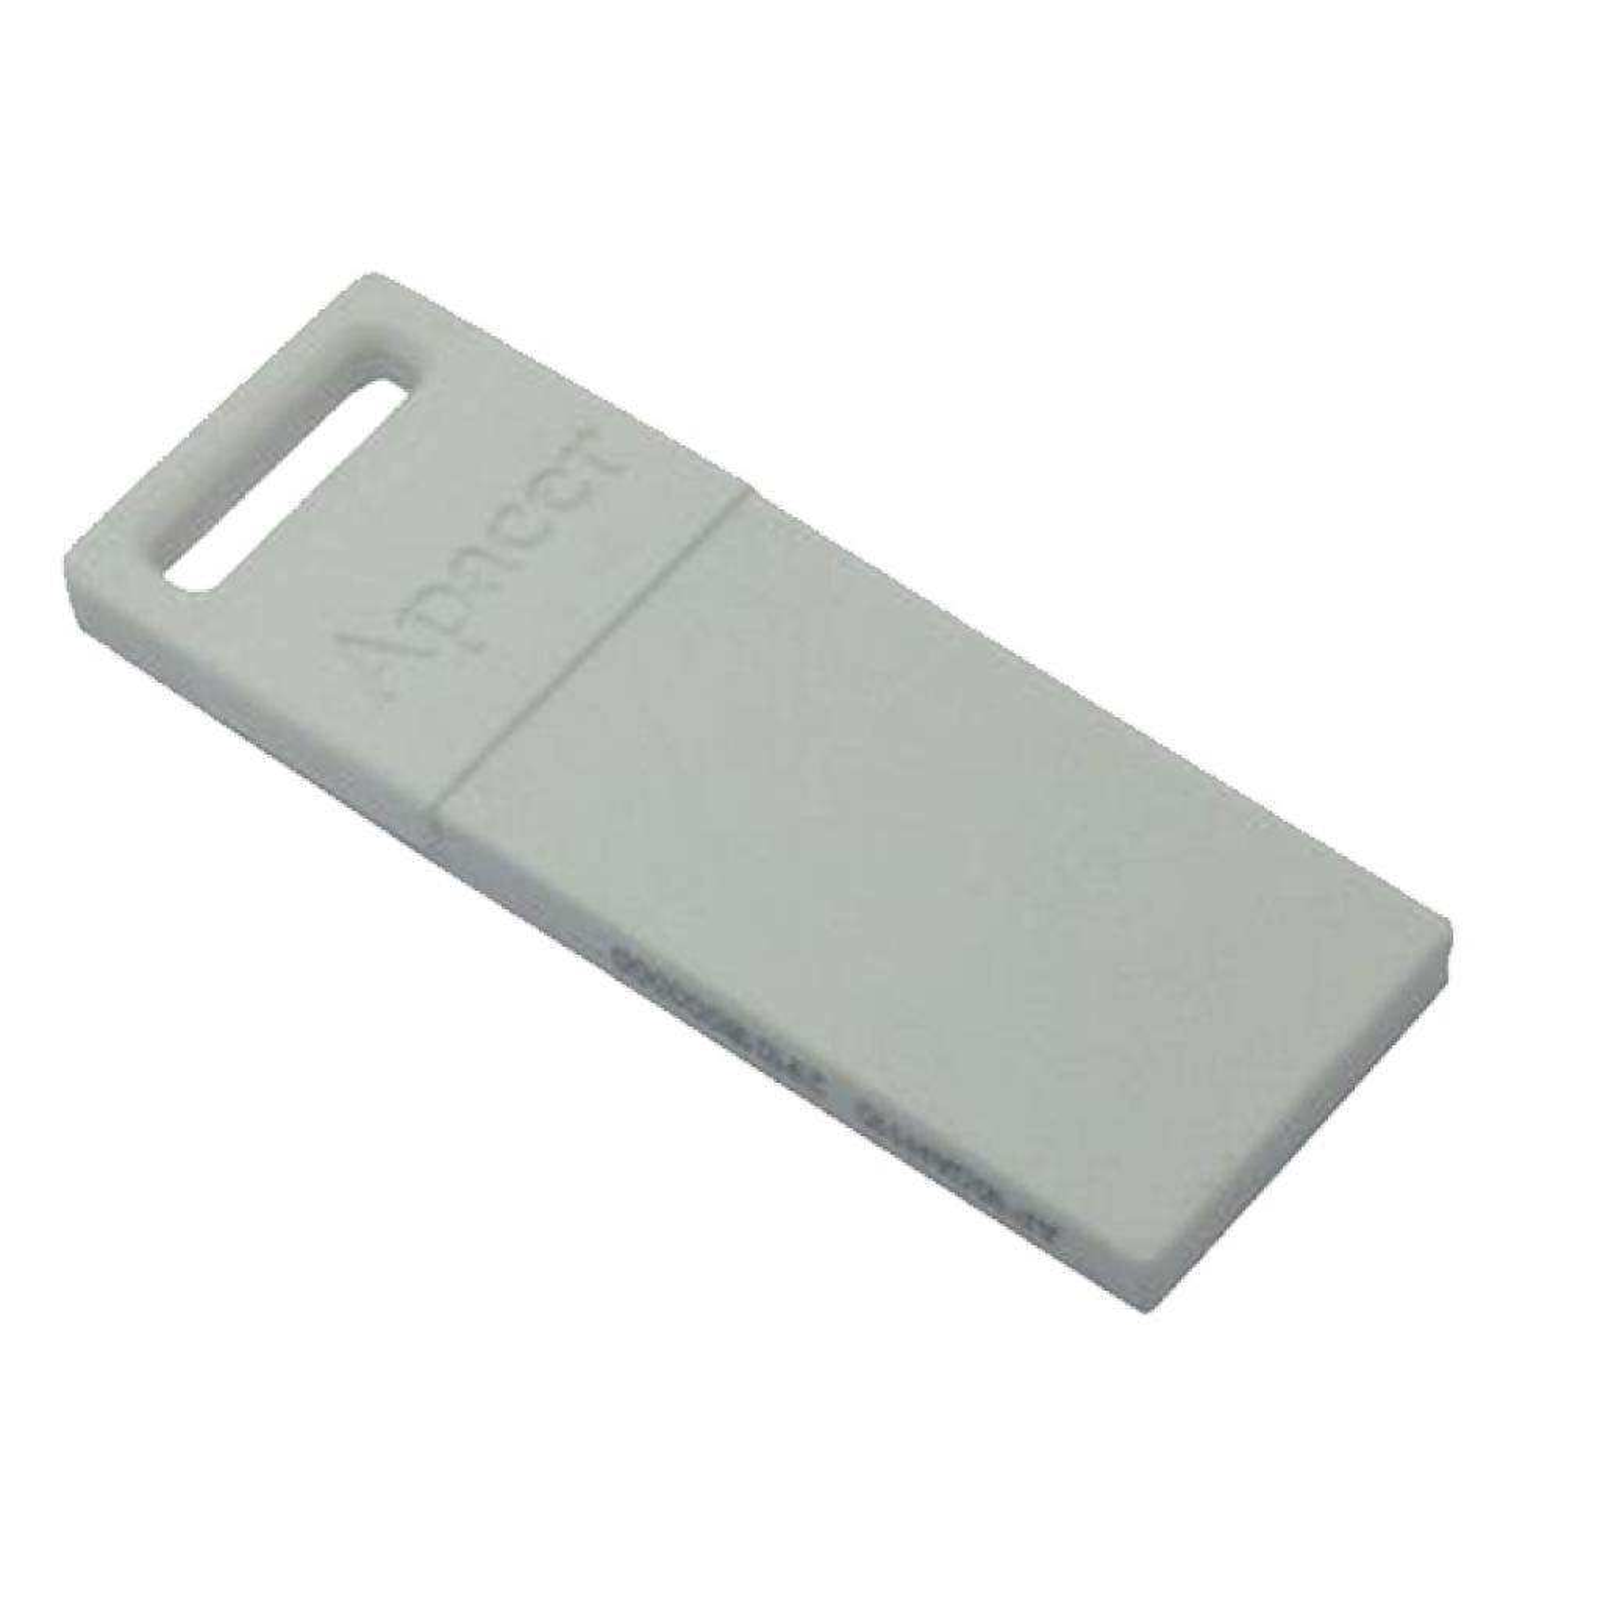 USB флеш накопитель 8GB AH110 White RP USB2.0 Apacer (AP8GAH110W-1) изображение 3